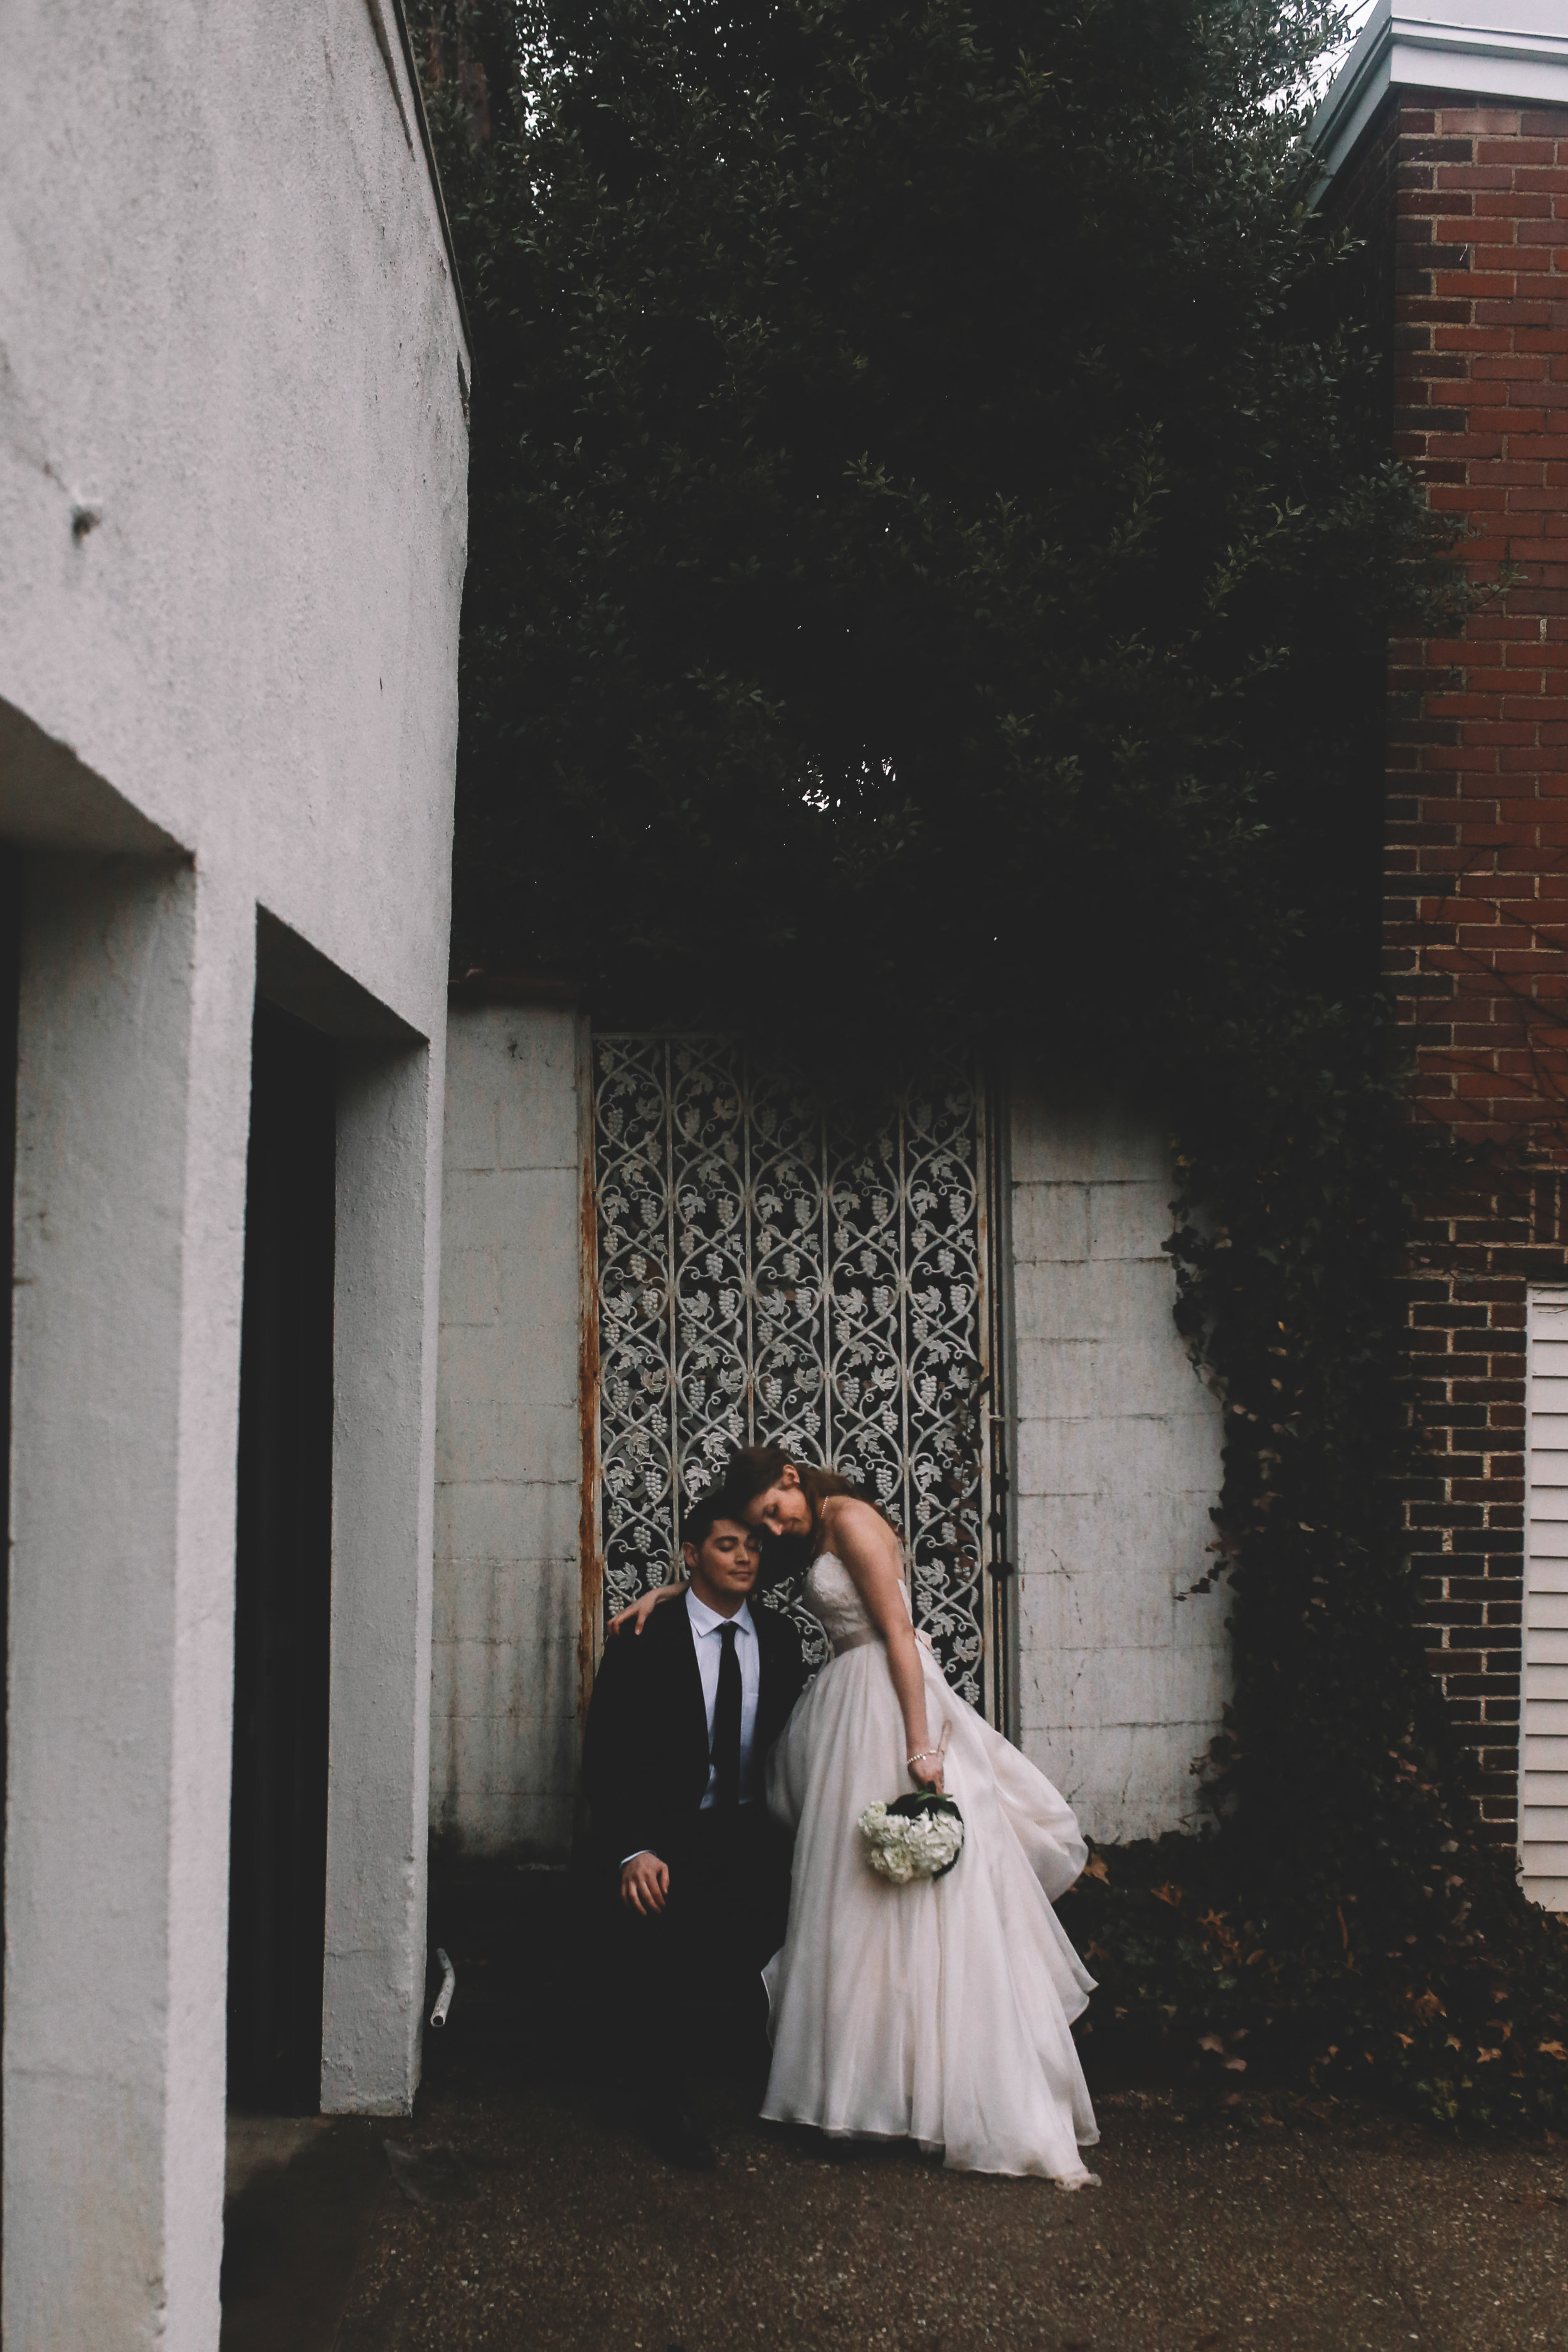 Jake + Brittney Balbas Airbnb Carriage House Wedding Evansville IN (348 of 426).jpg